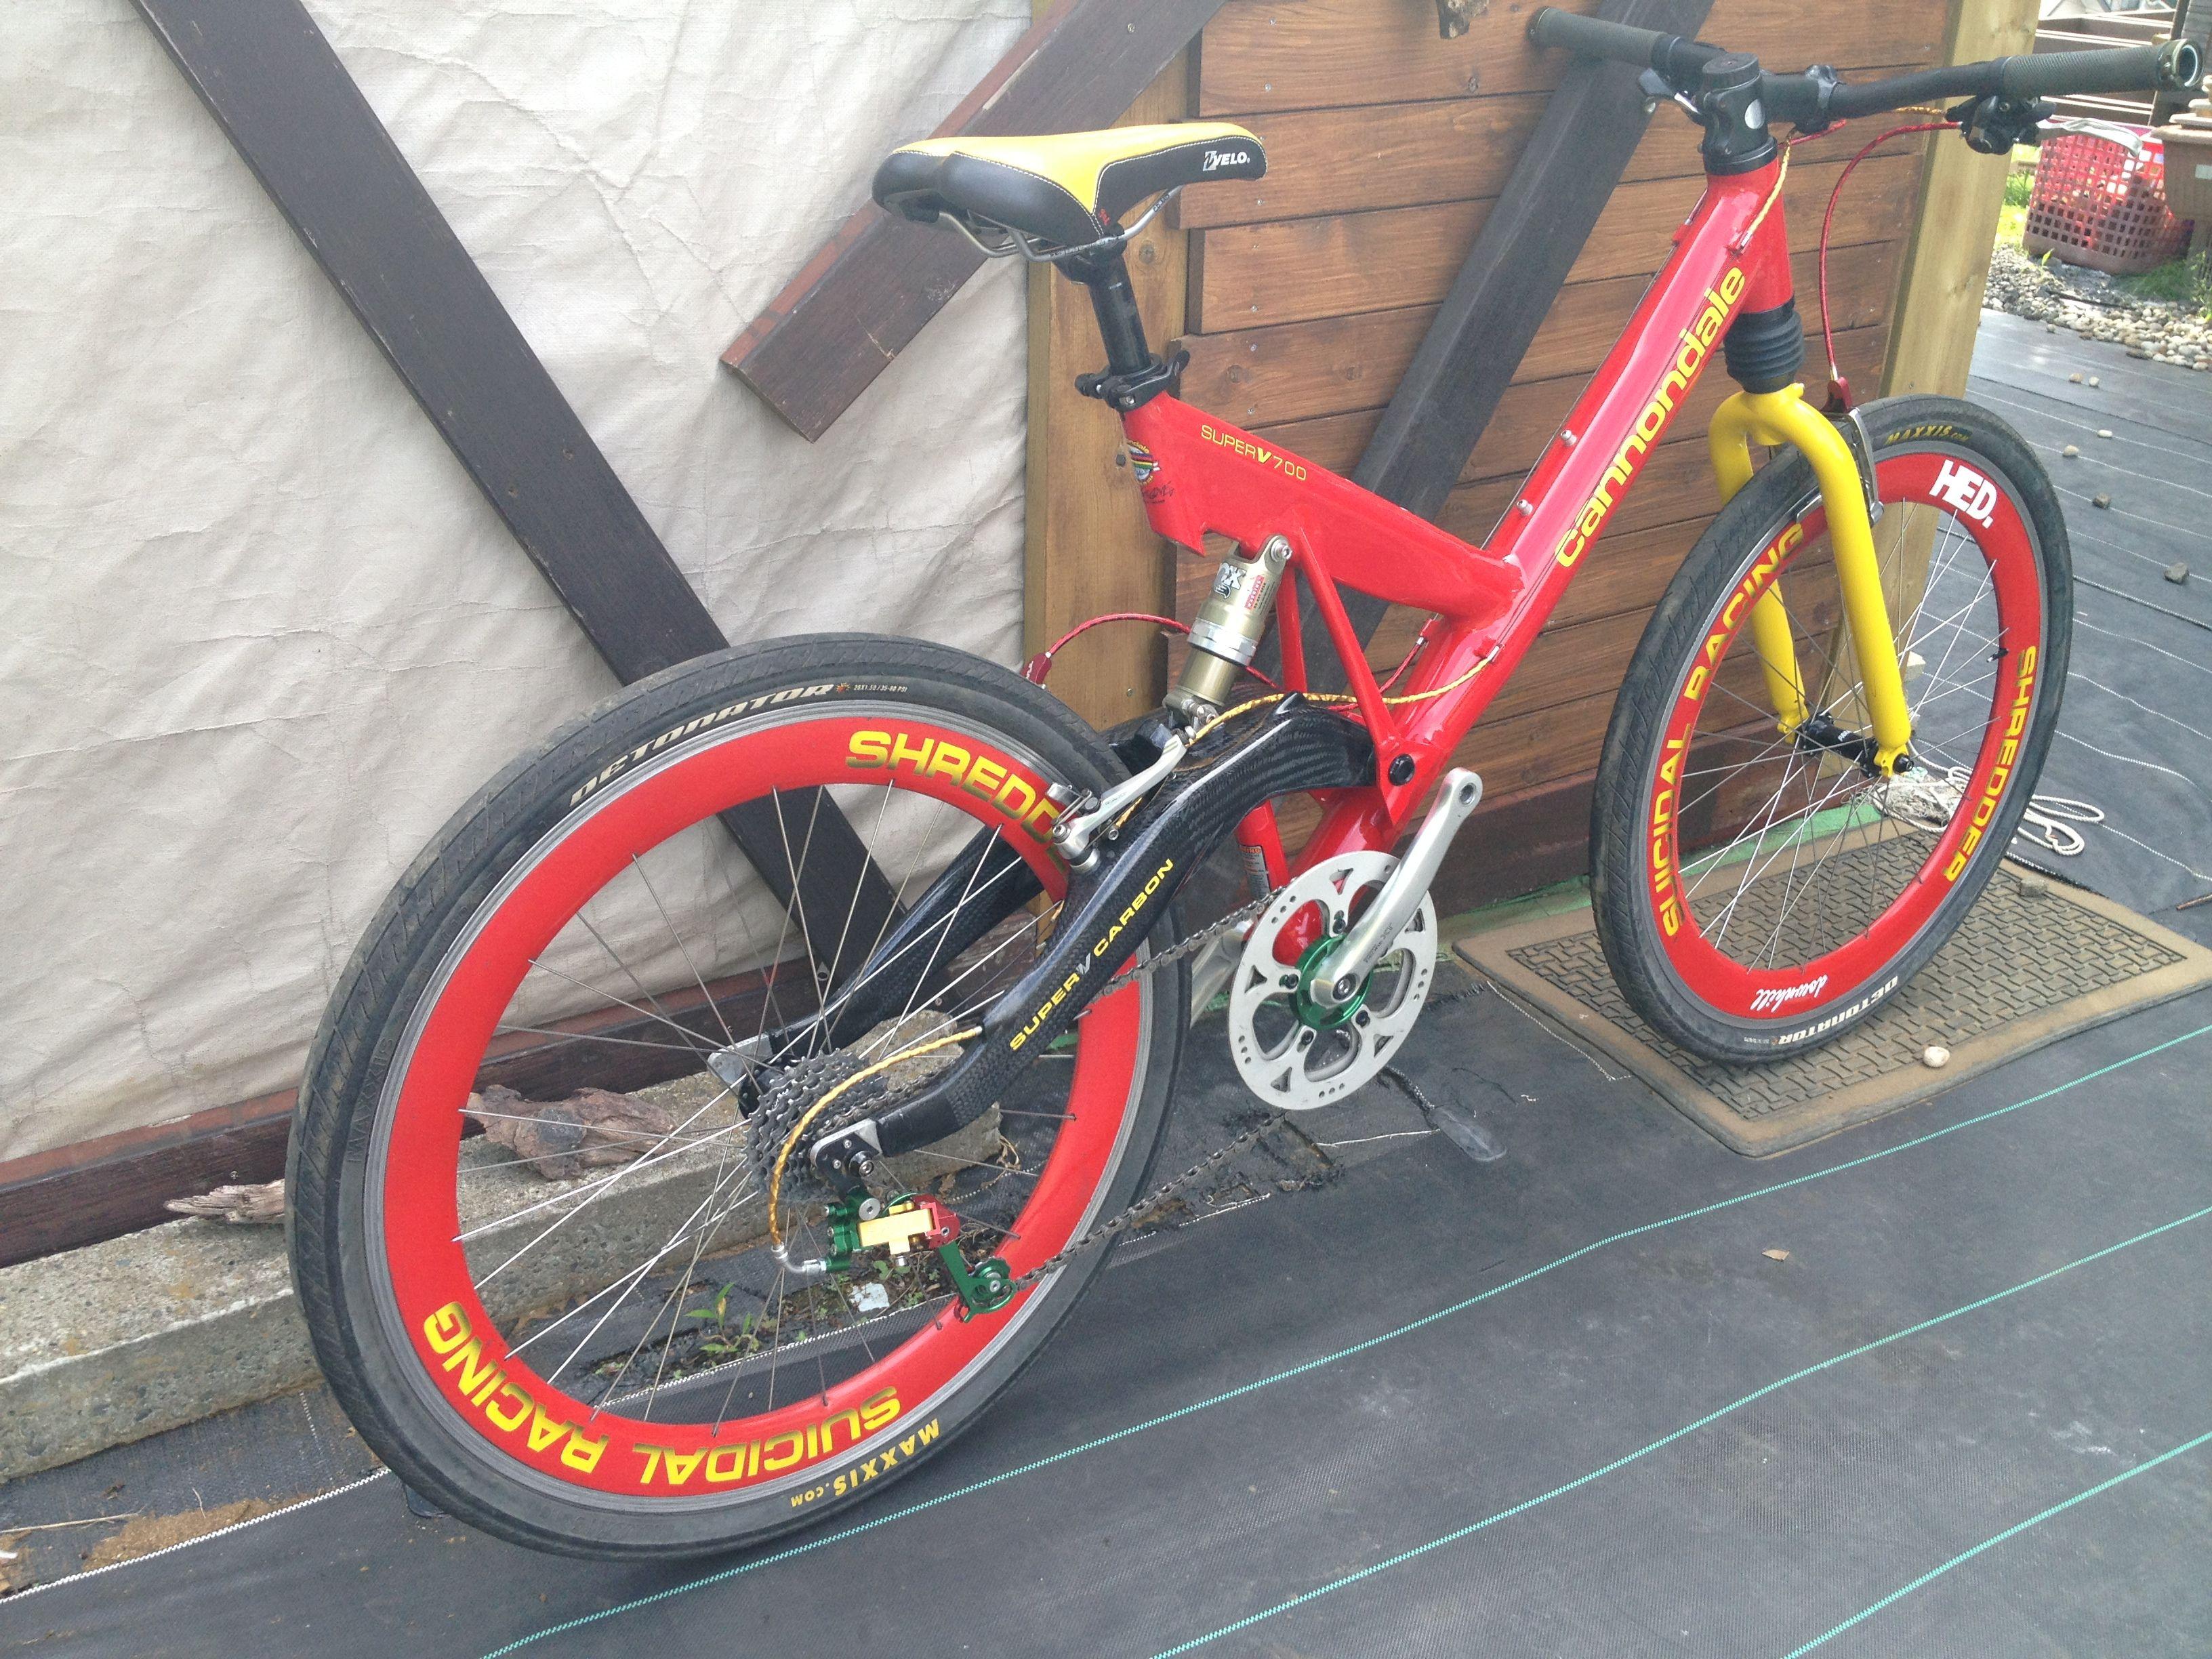 b4ed1142d60 Cannondale Super V 700 Carbon | FreeRide | Mtb bike, Mt bike ...